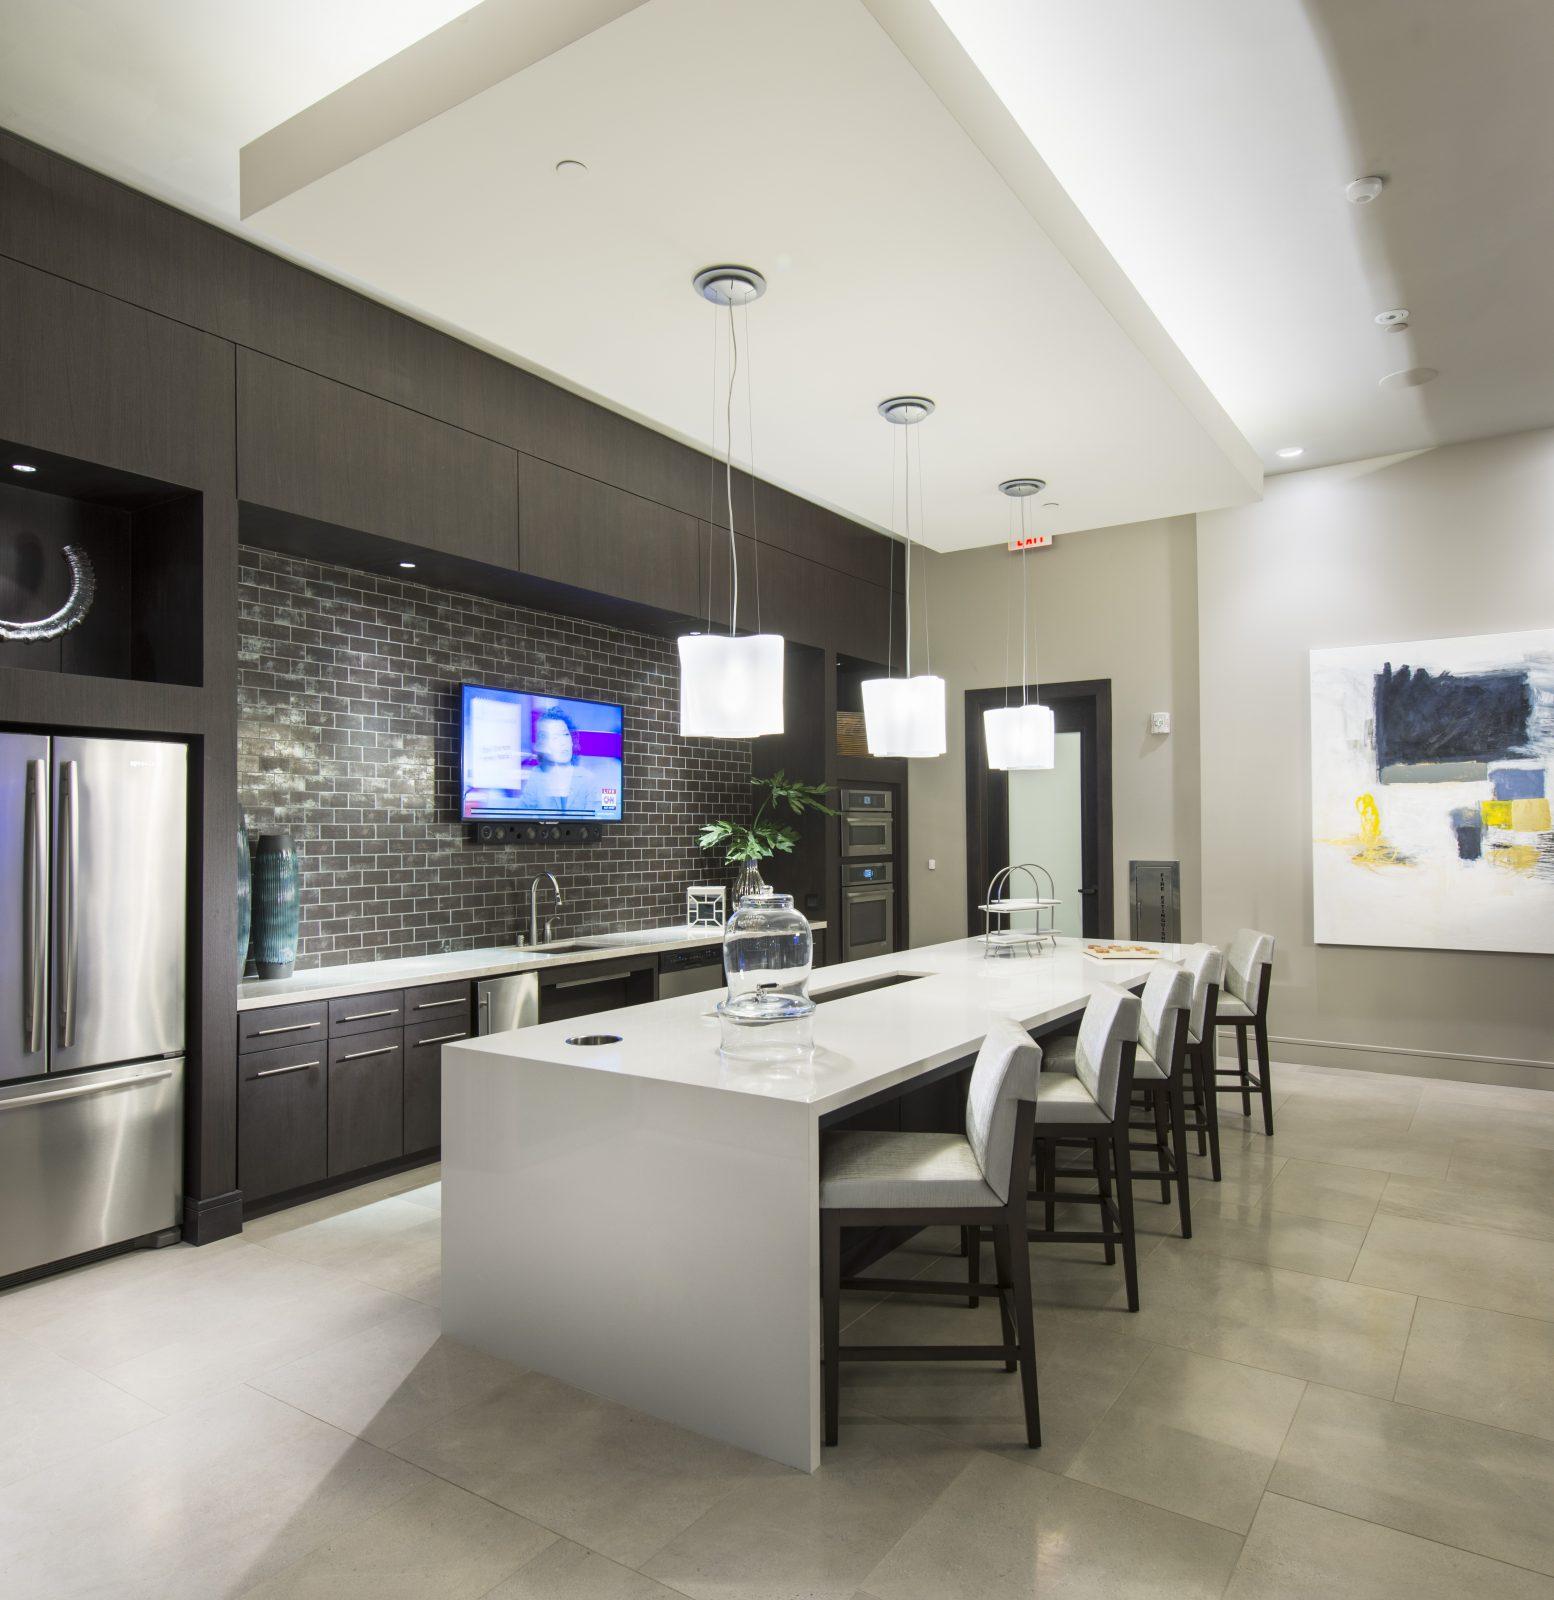 Apartments For Rent In Philly: Philadelphia Apartment & Condo